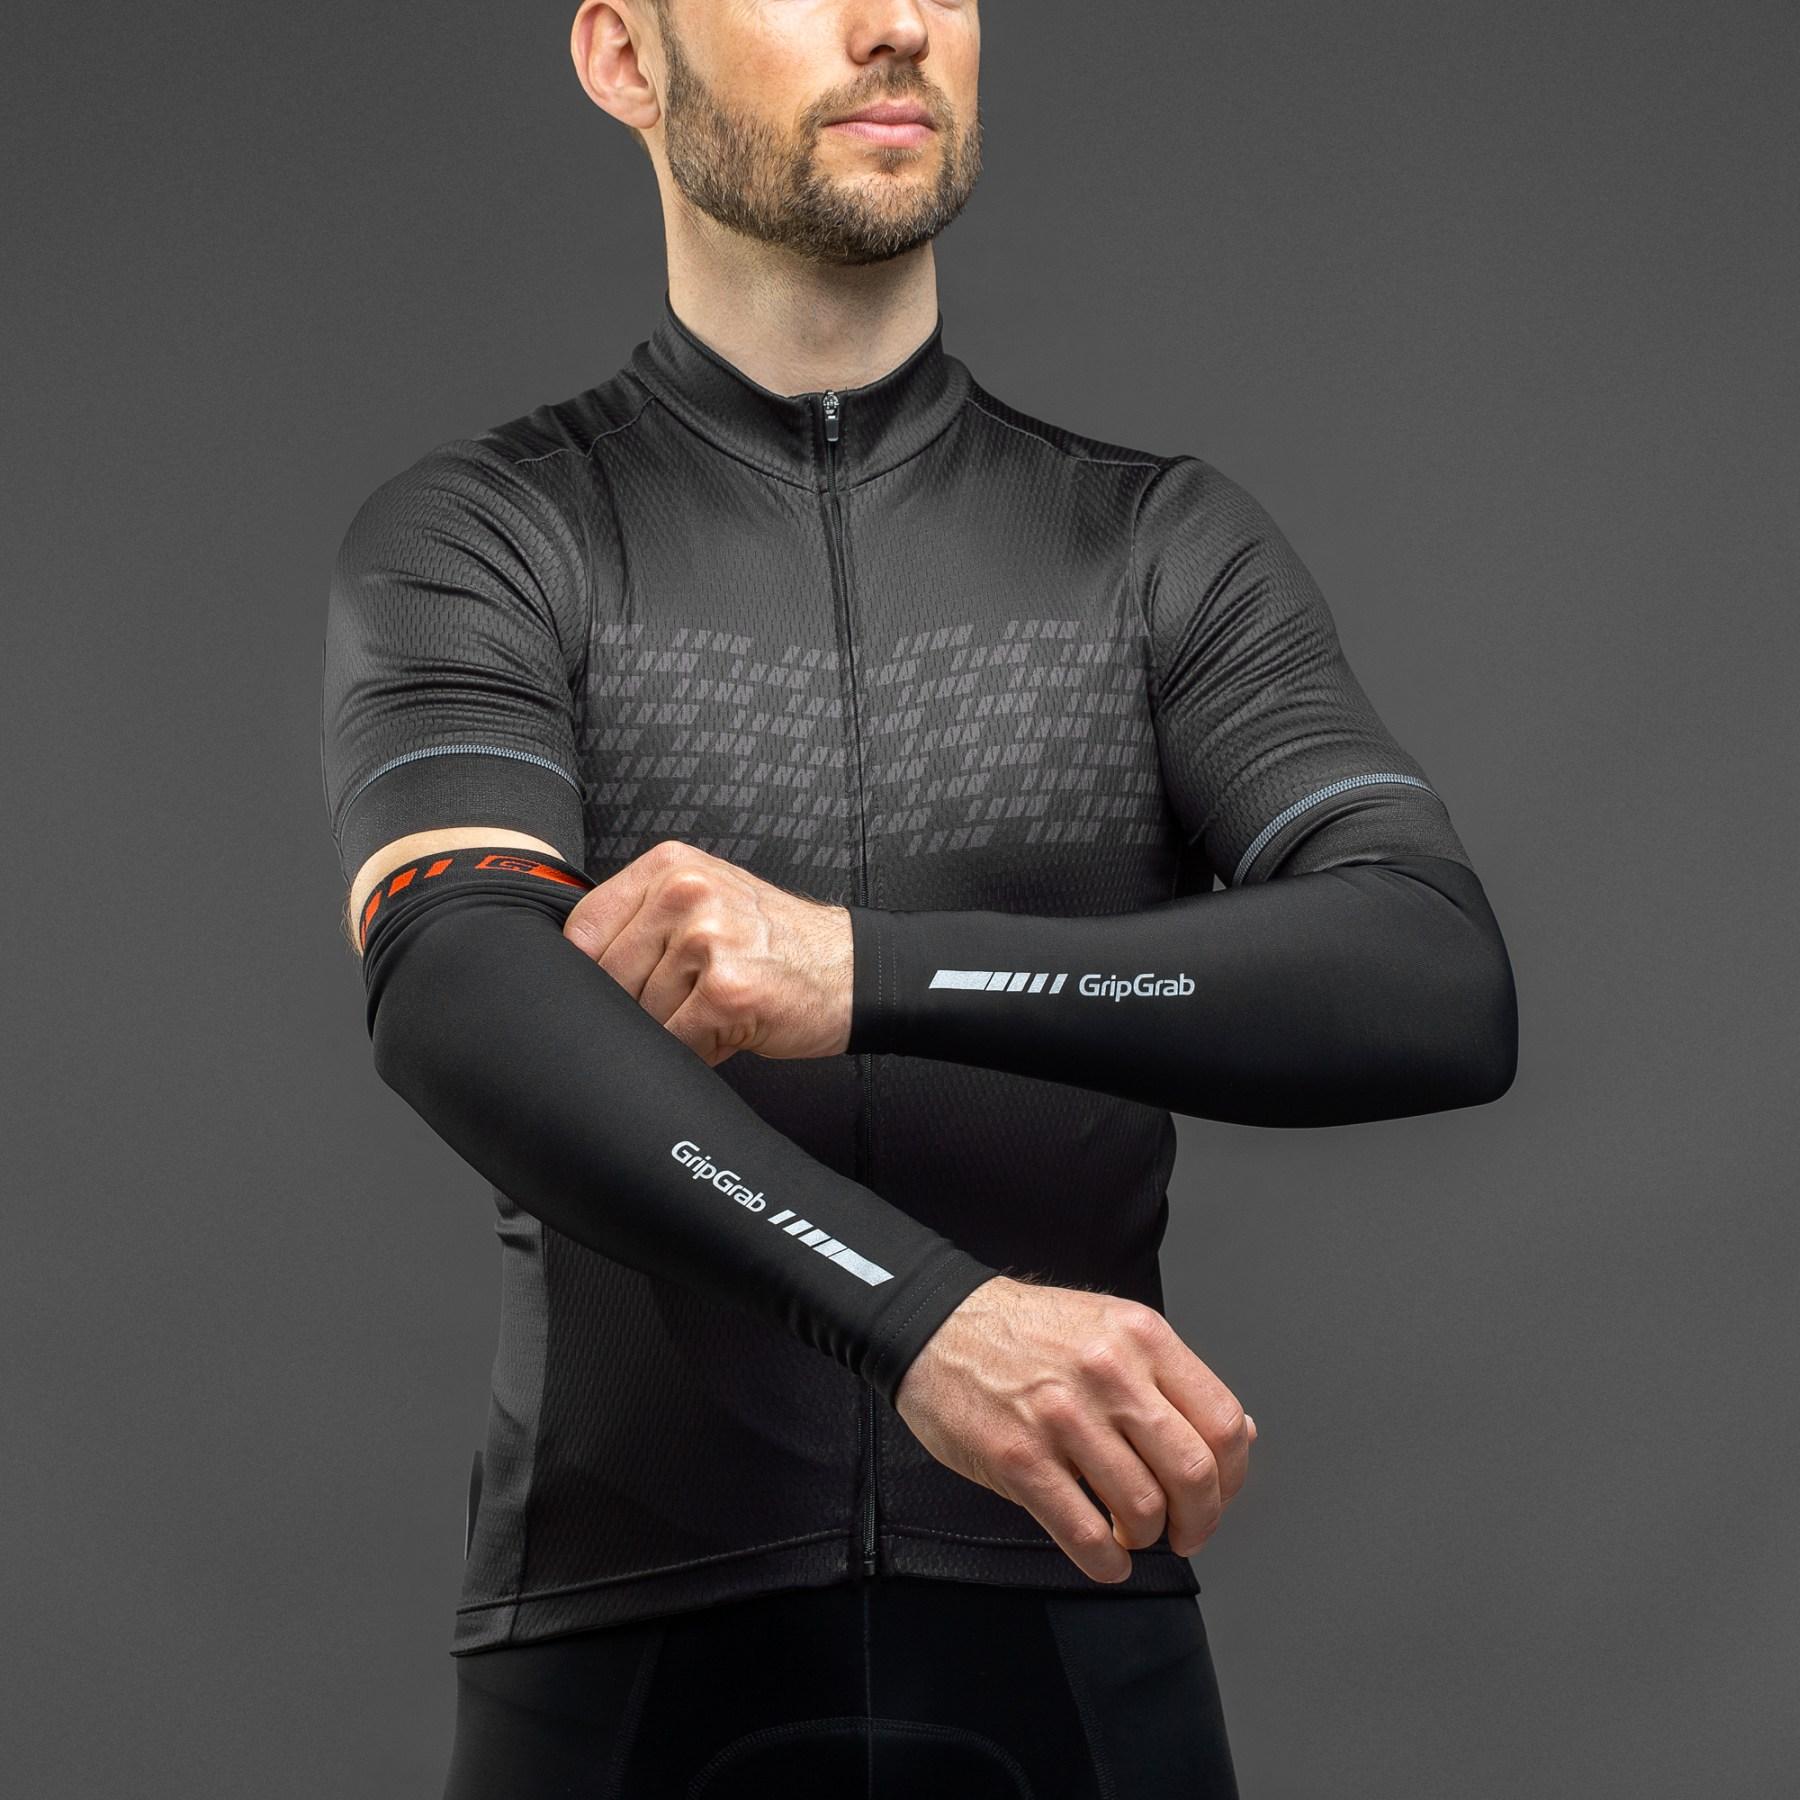 Image of GripGrab AquaRepel Thermal Arm Warmers - Black